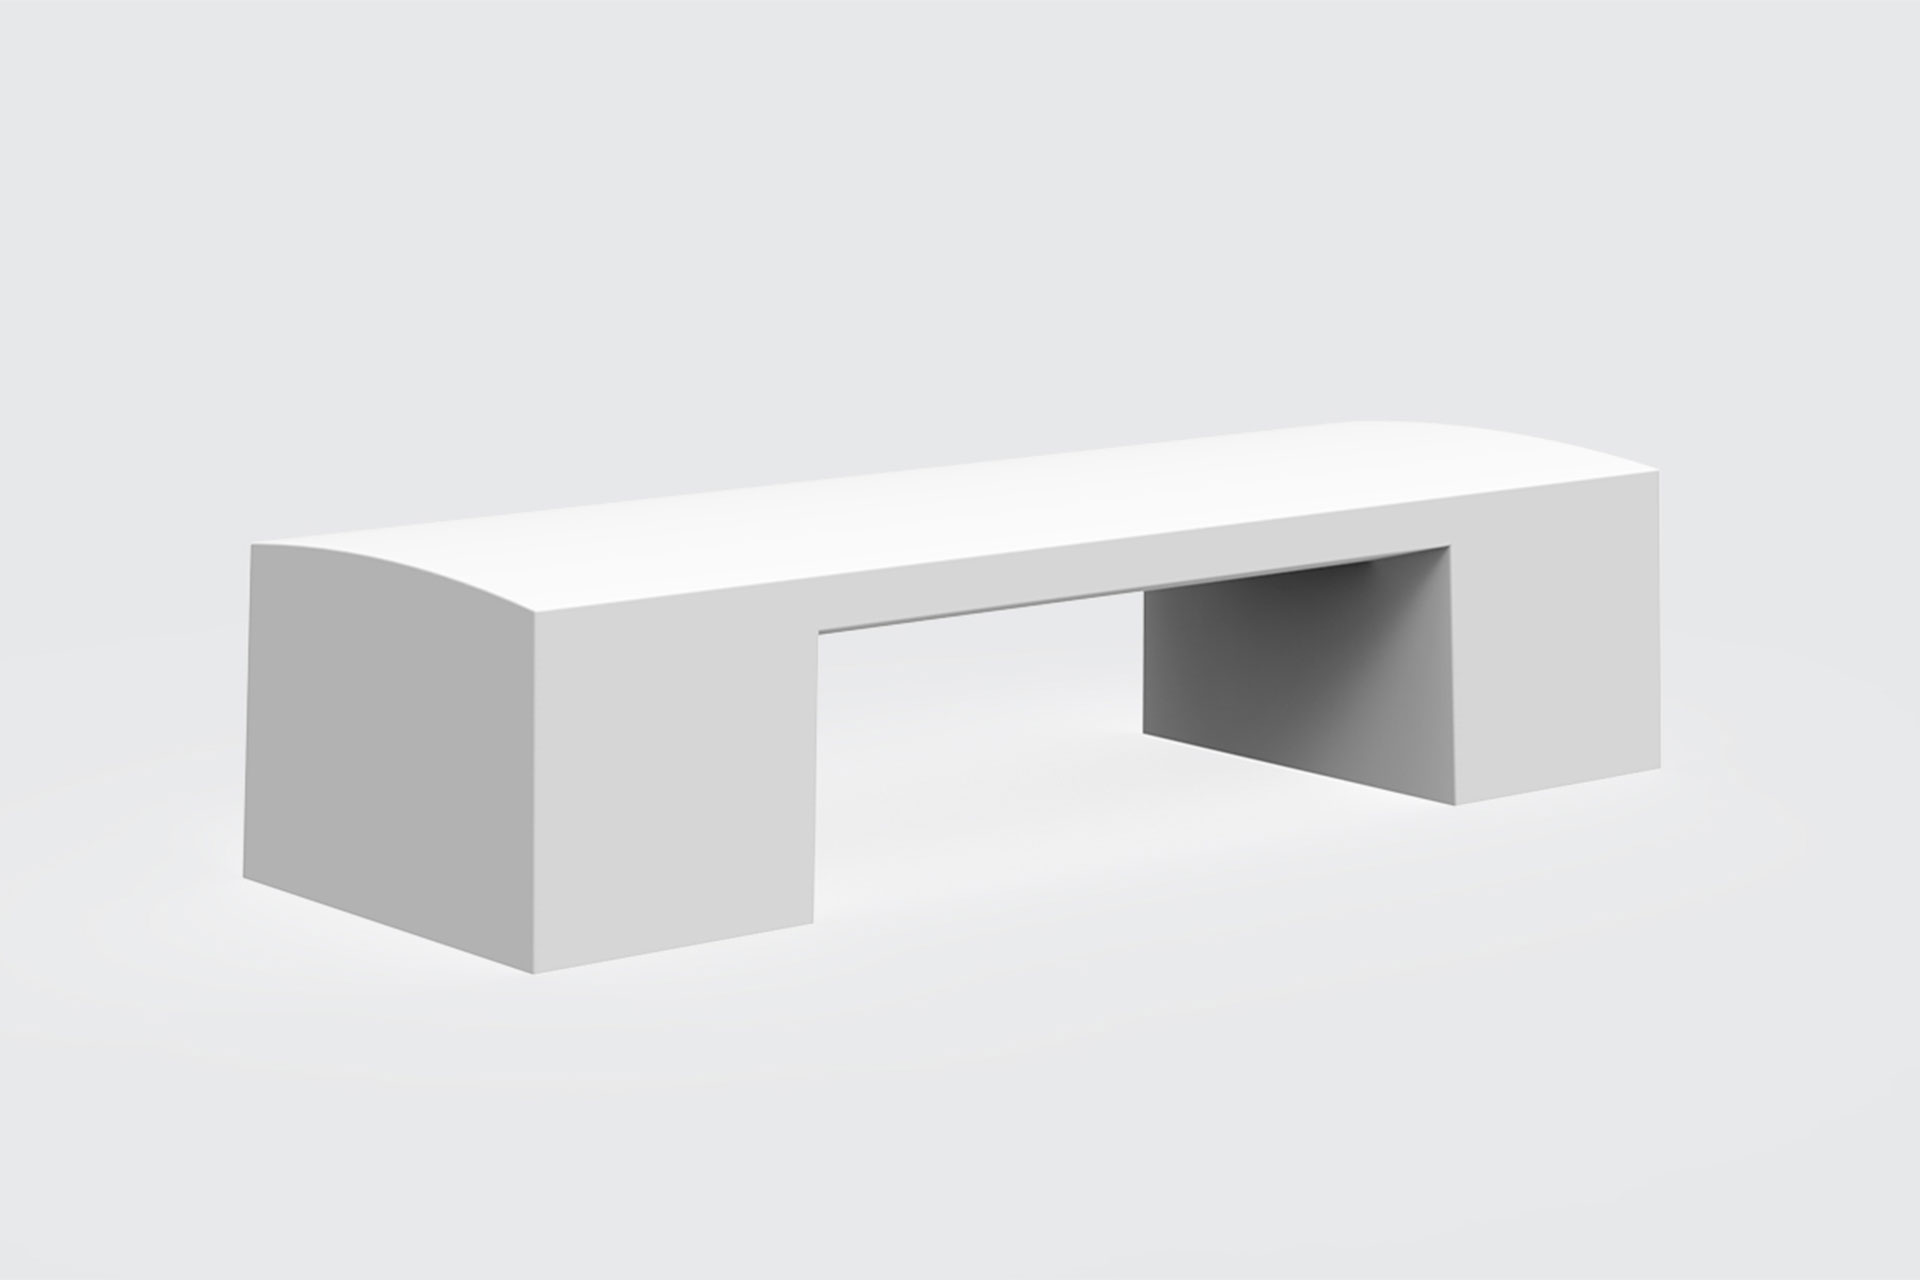 UrbanObjekts Sueste Sitzgelegenheit